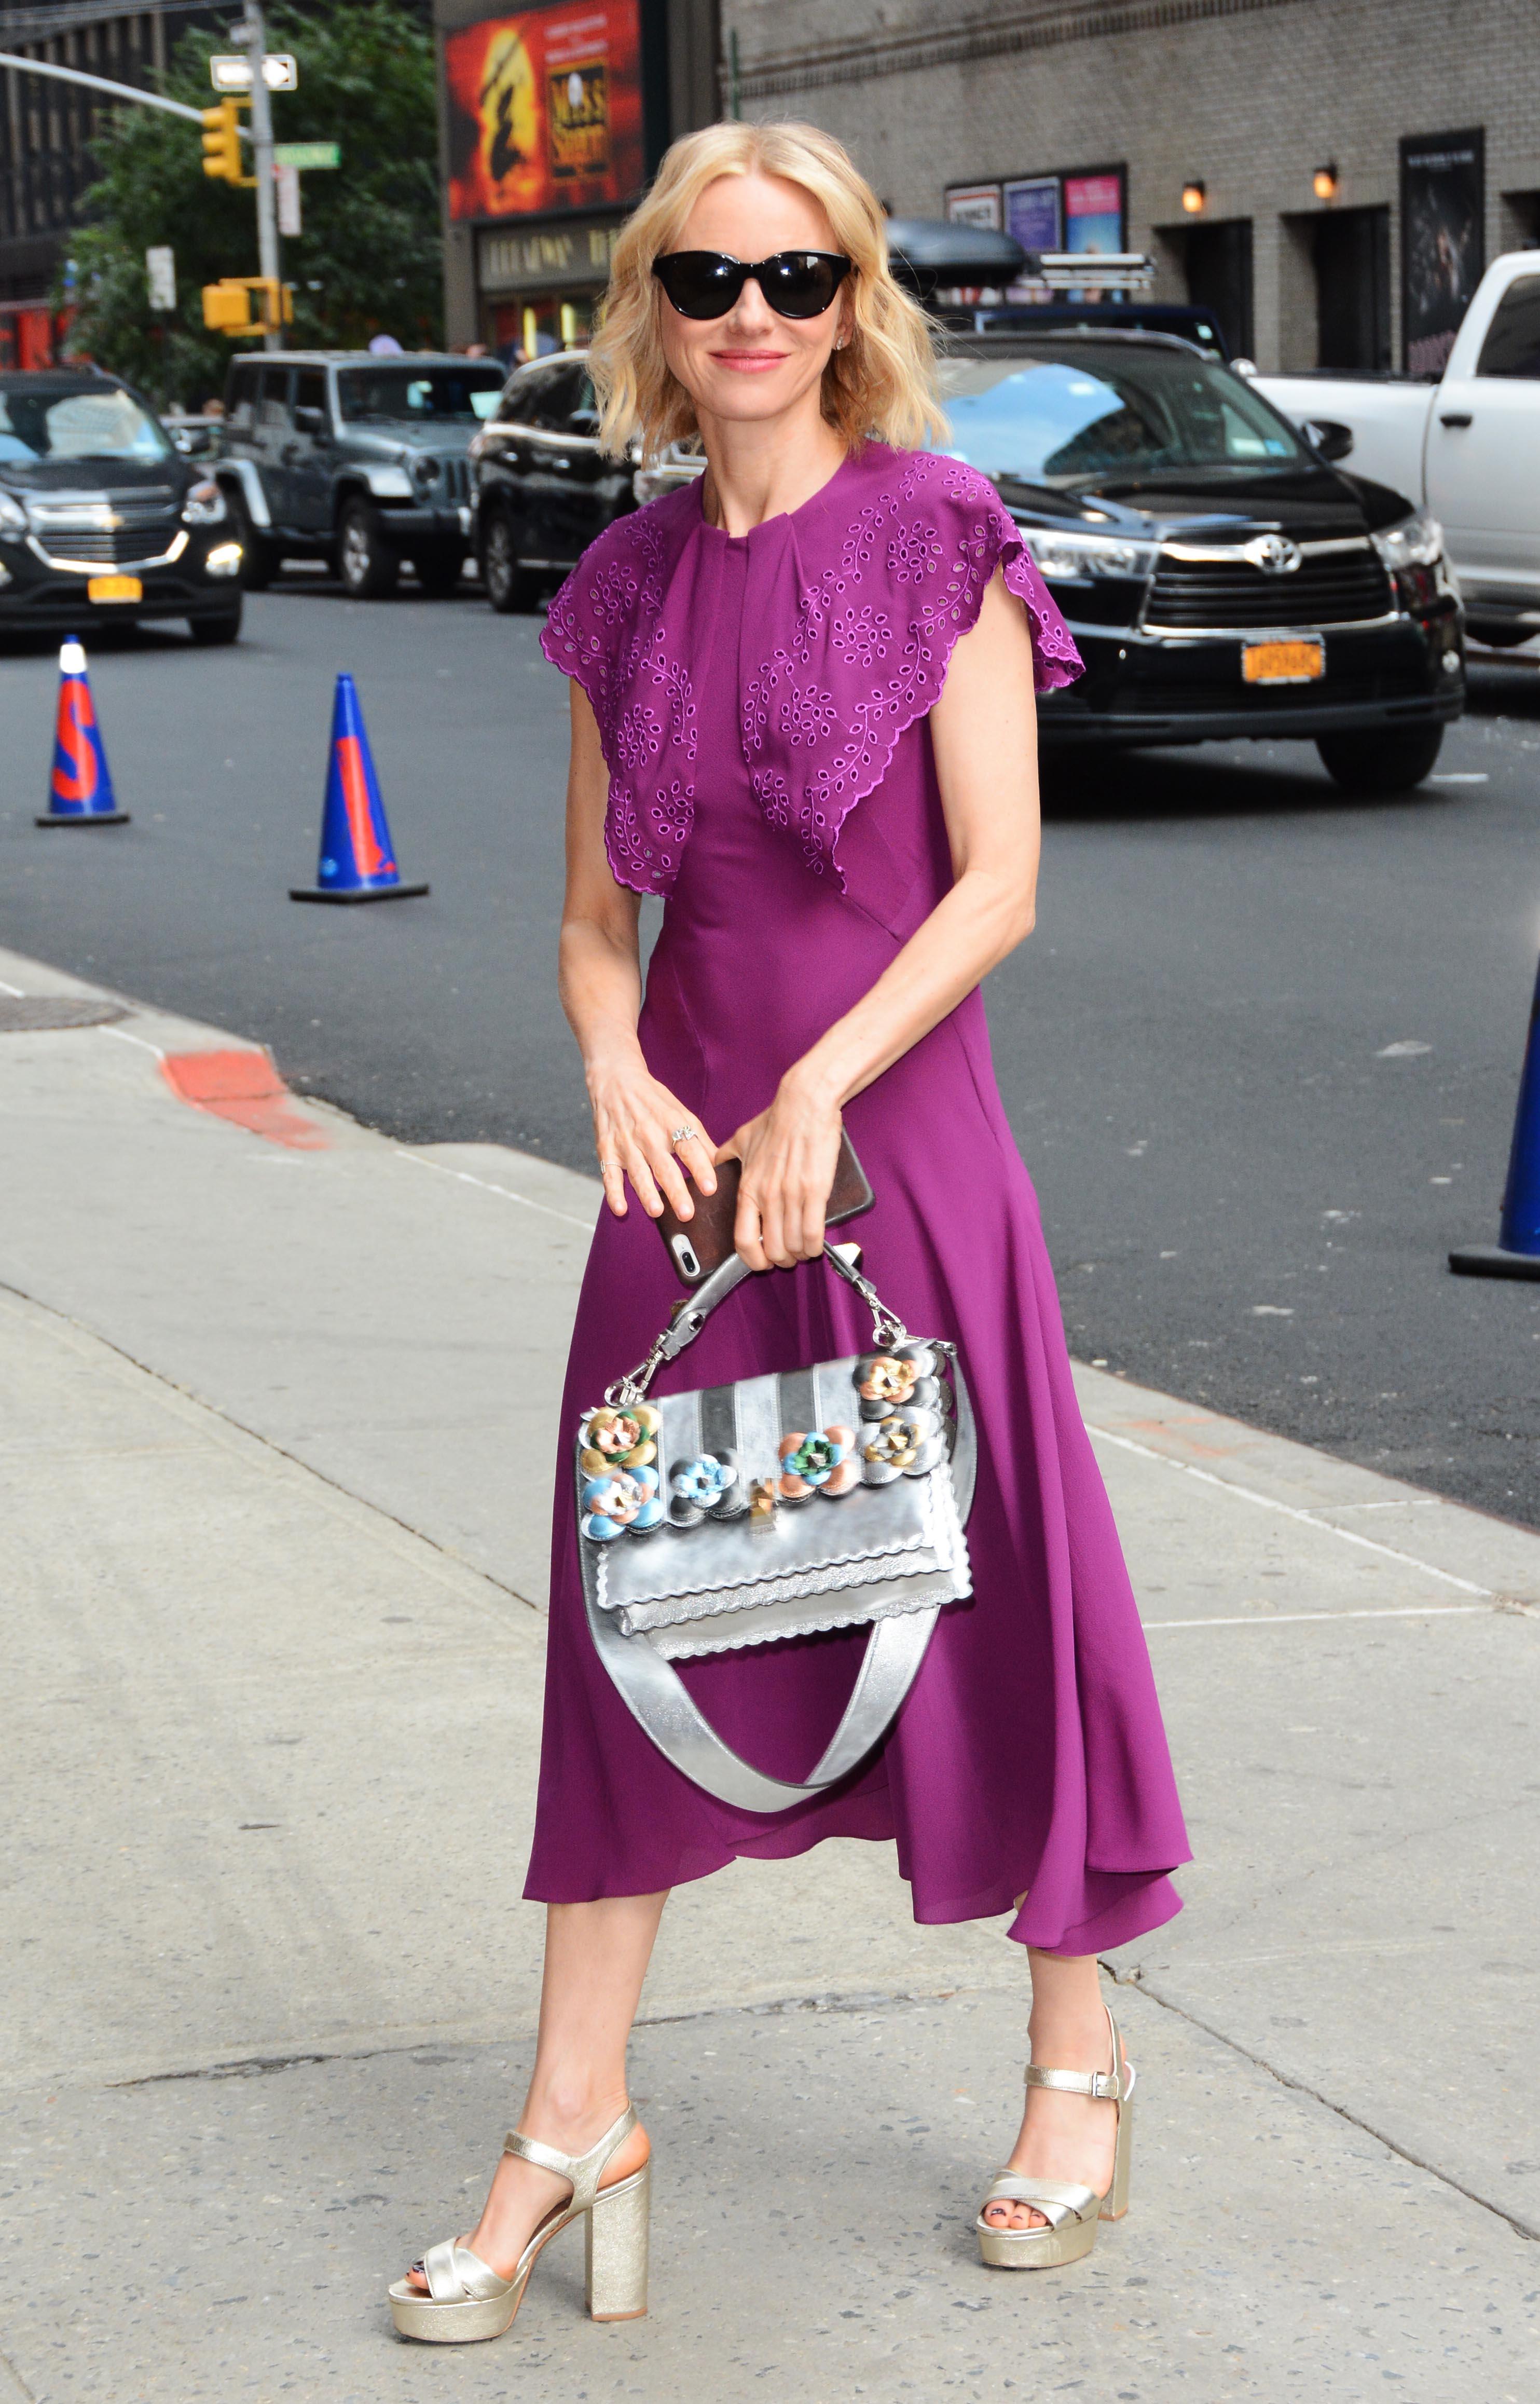 Celebrity Sightings In New York City - June 29, 2017